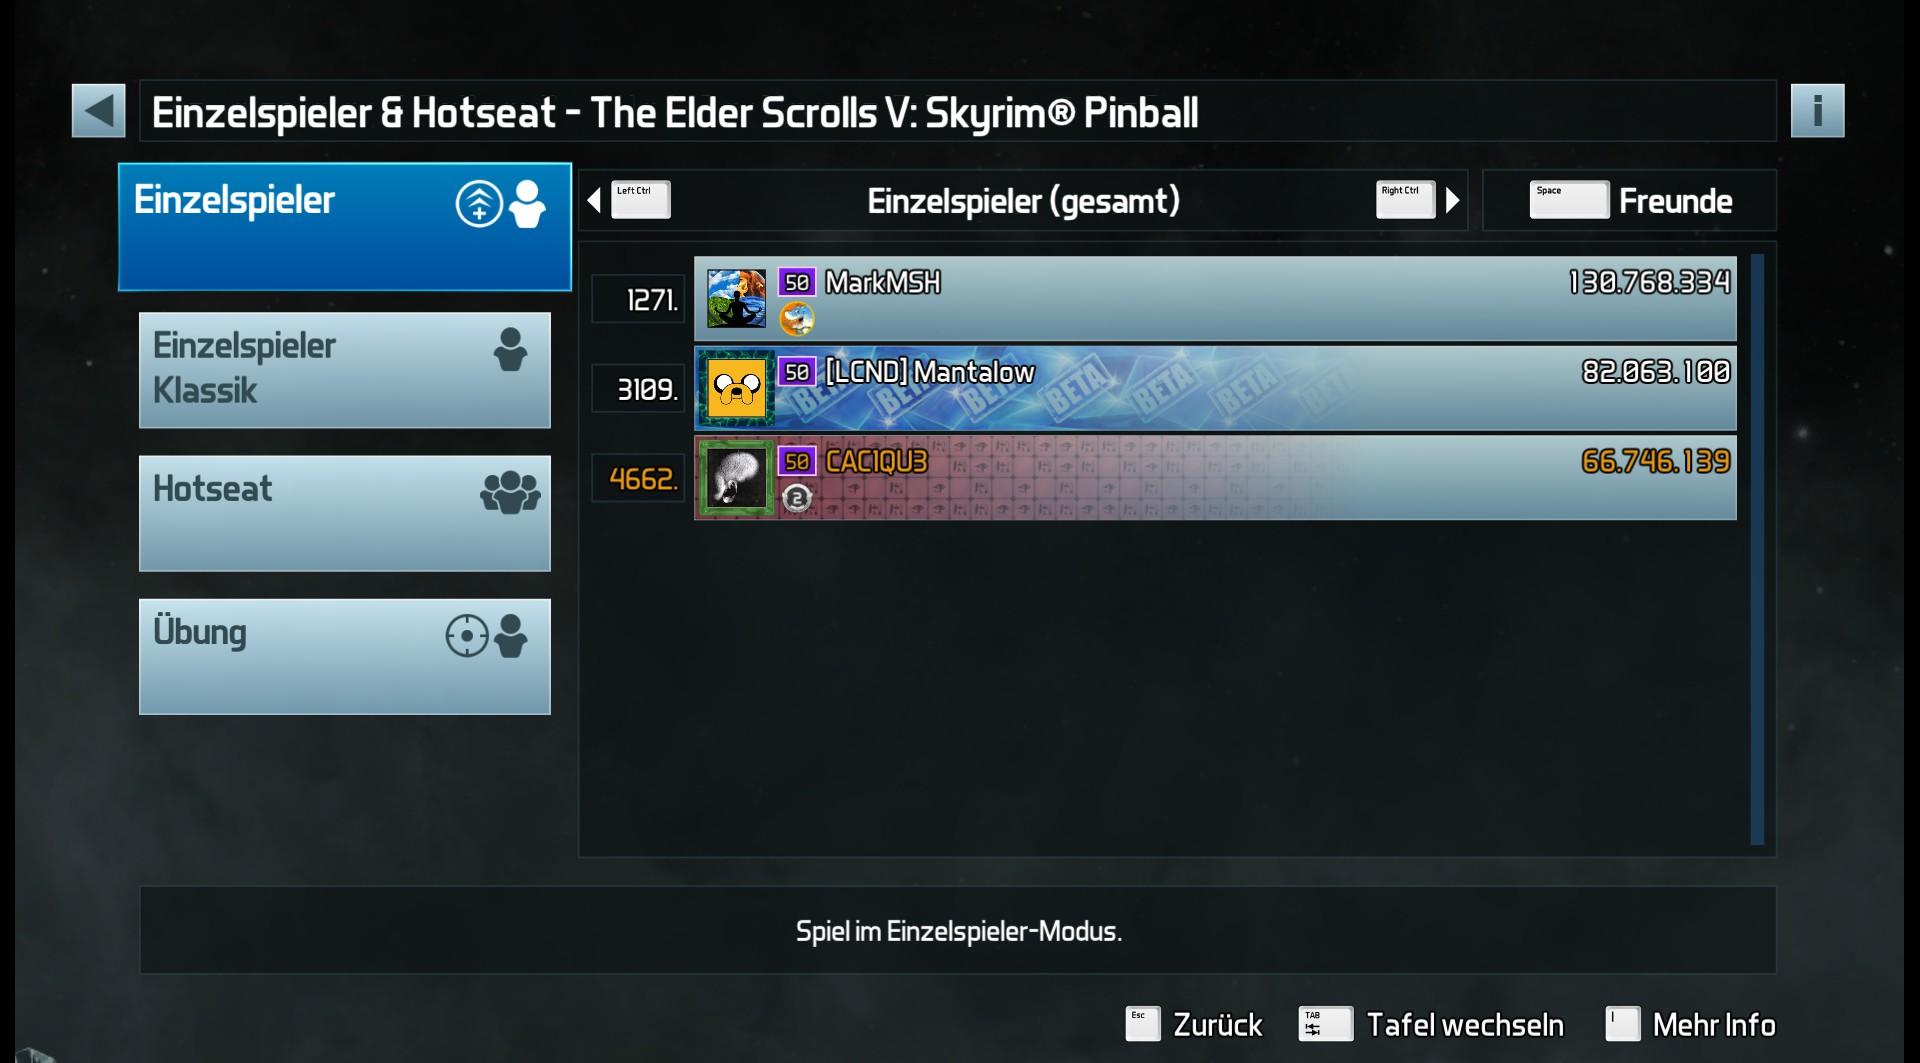 CAC1QU3: Pinball FX3: The Elder Scrolls V: Skyrim Pinball (PC) 66,746,139 points on 2019-05-05 01:59:52